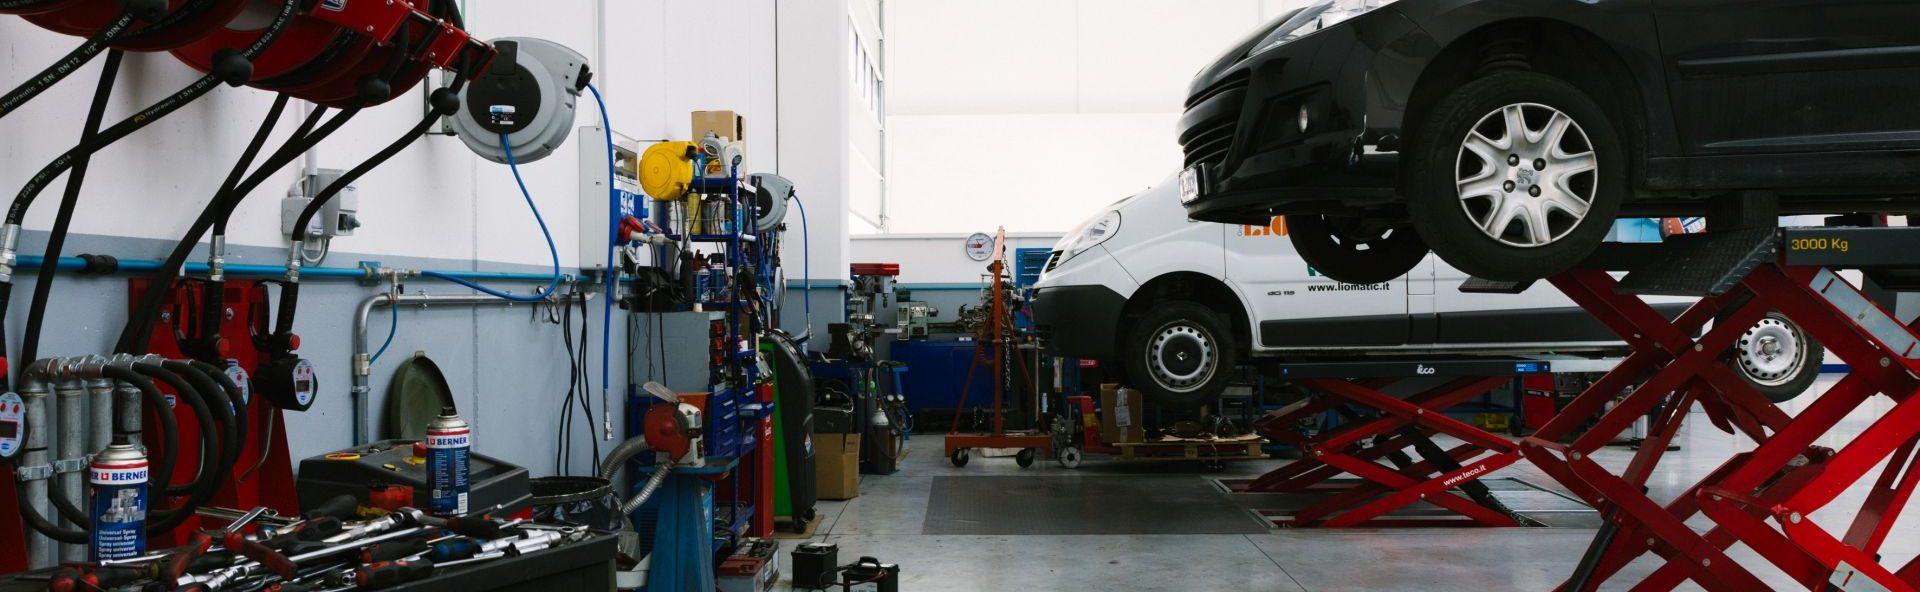 Tecnauto [Citroen + Peugeot] (4 di 13)